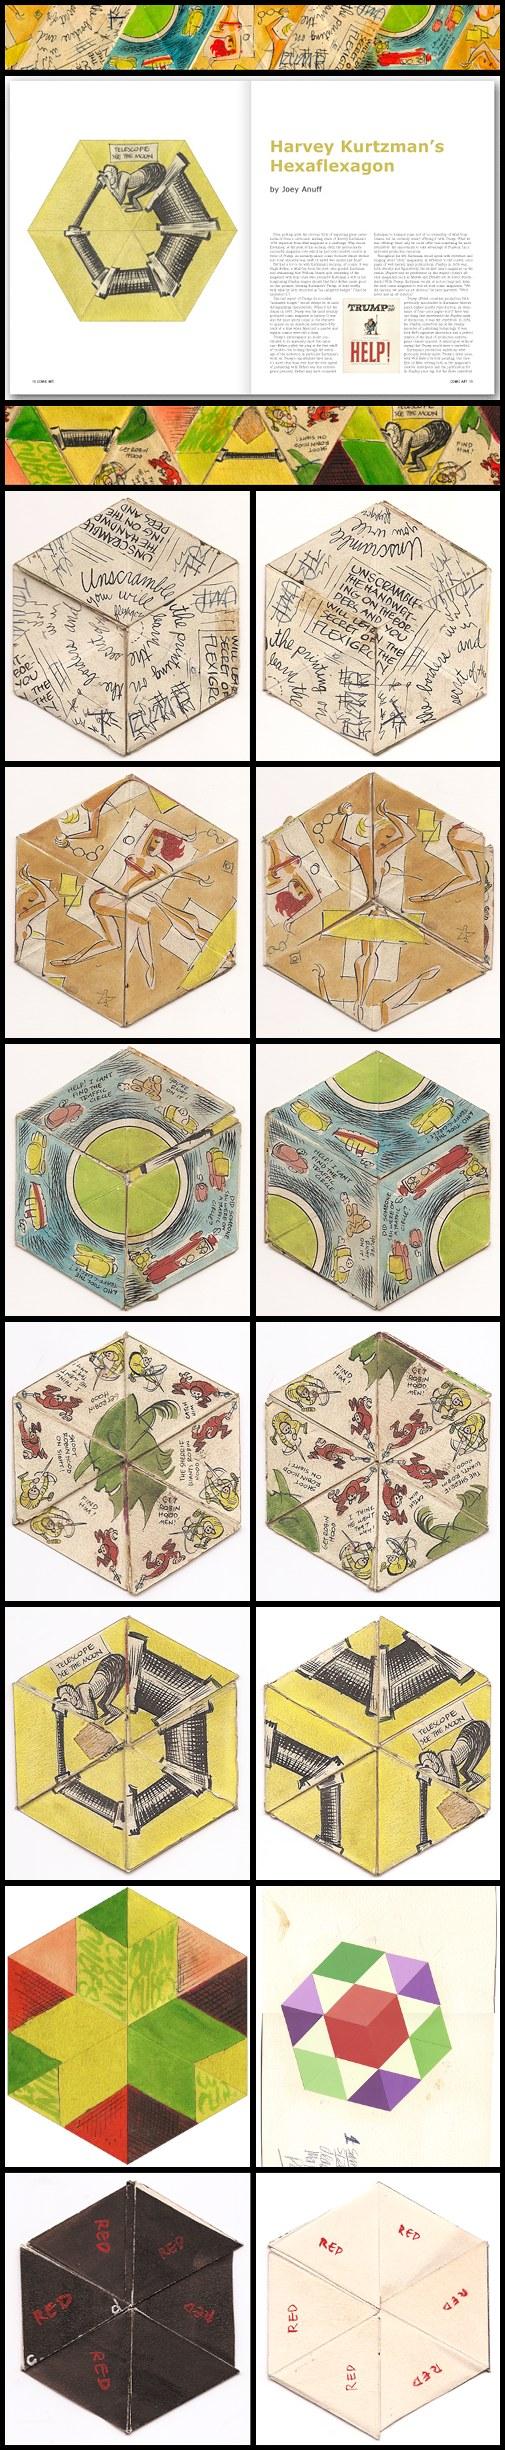 12. Trump #3: The Hexaflexagon, Overview (1957)